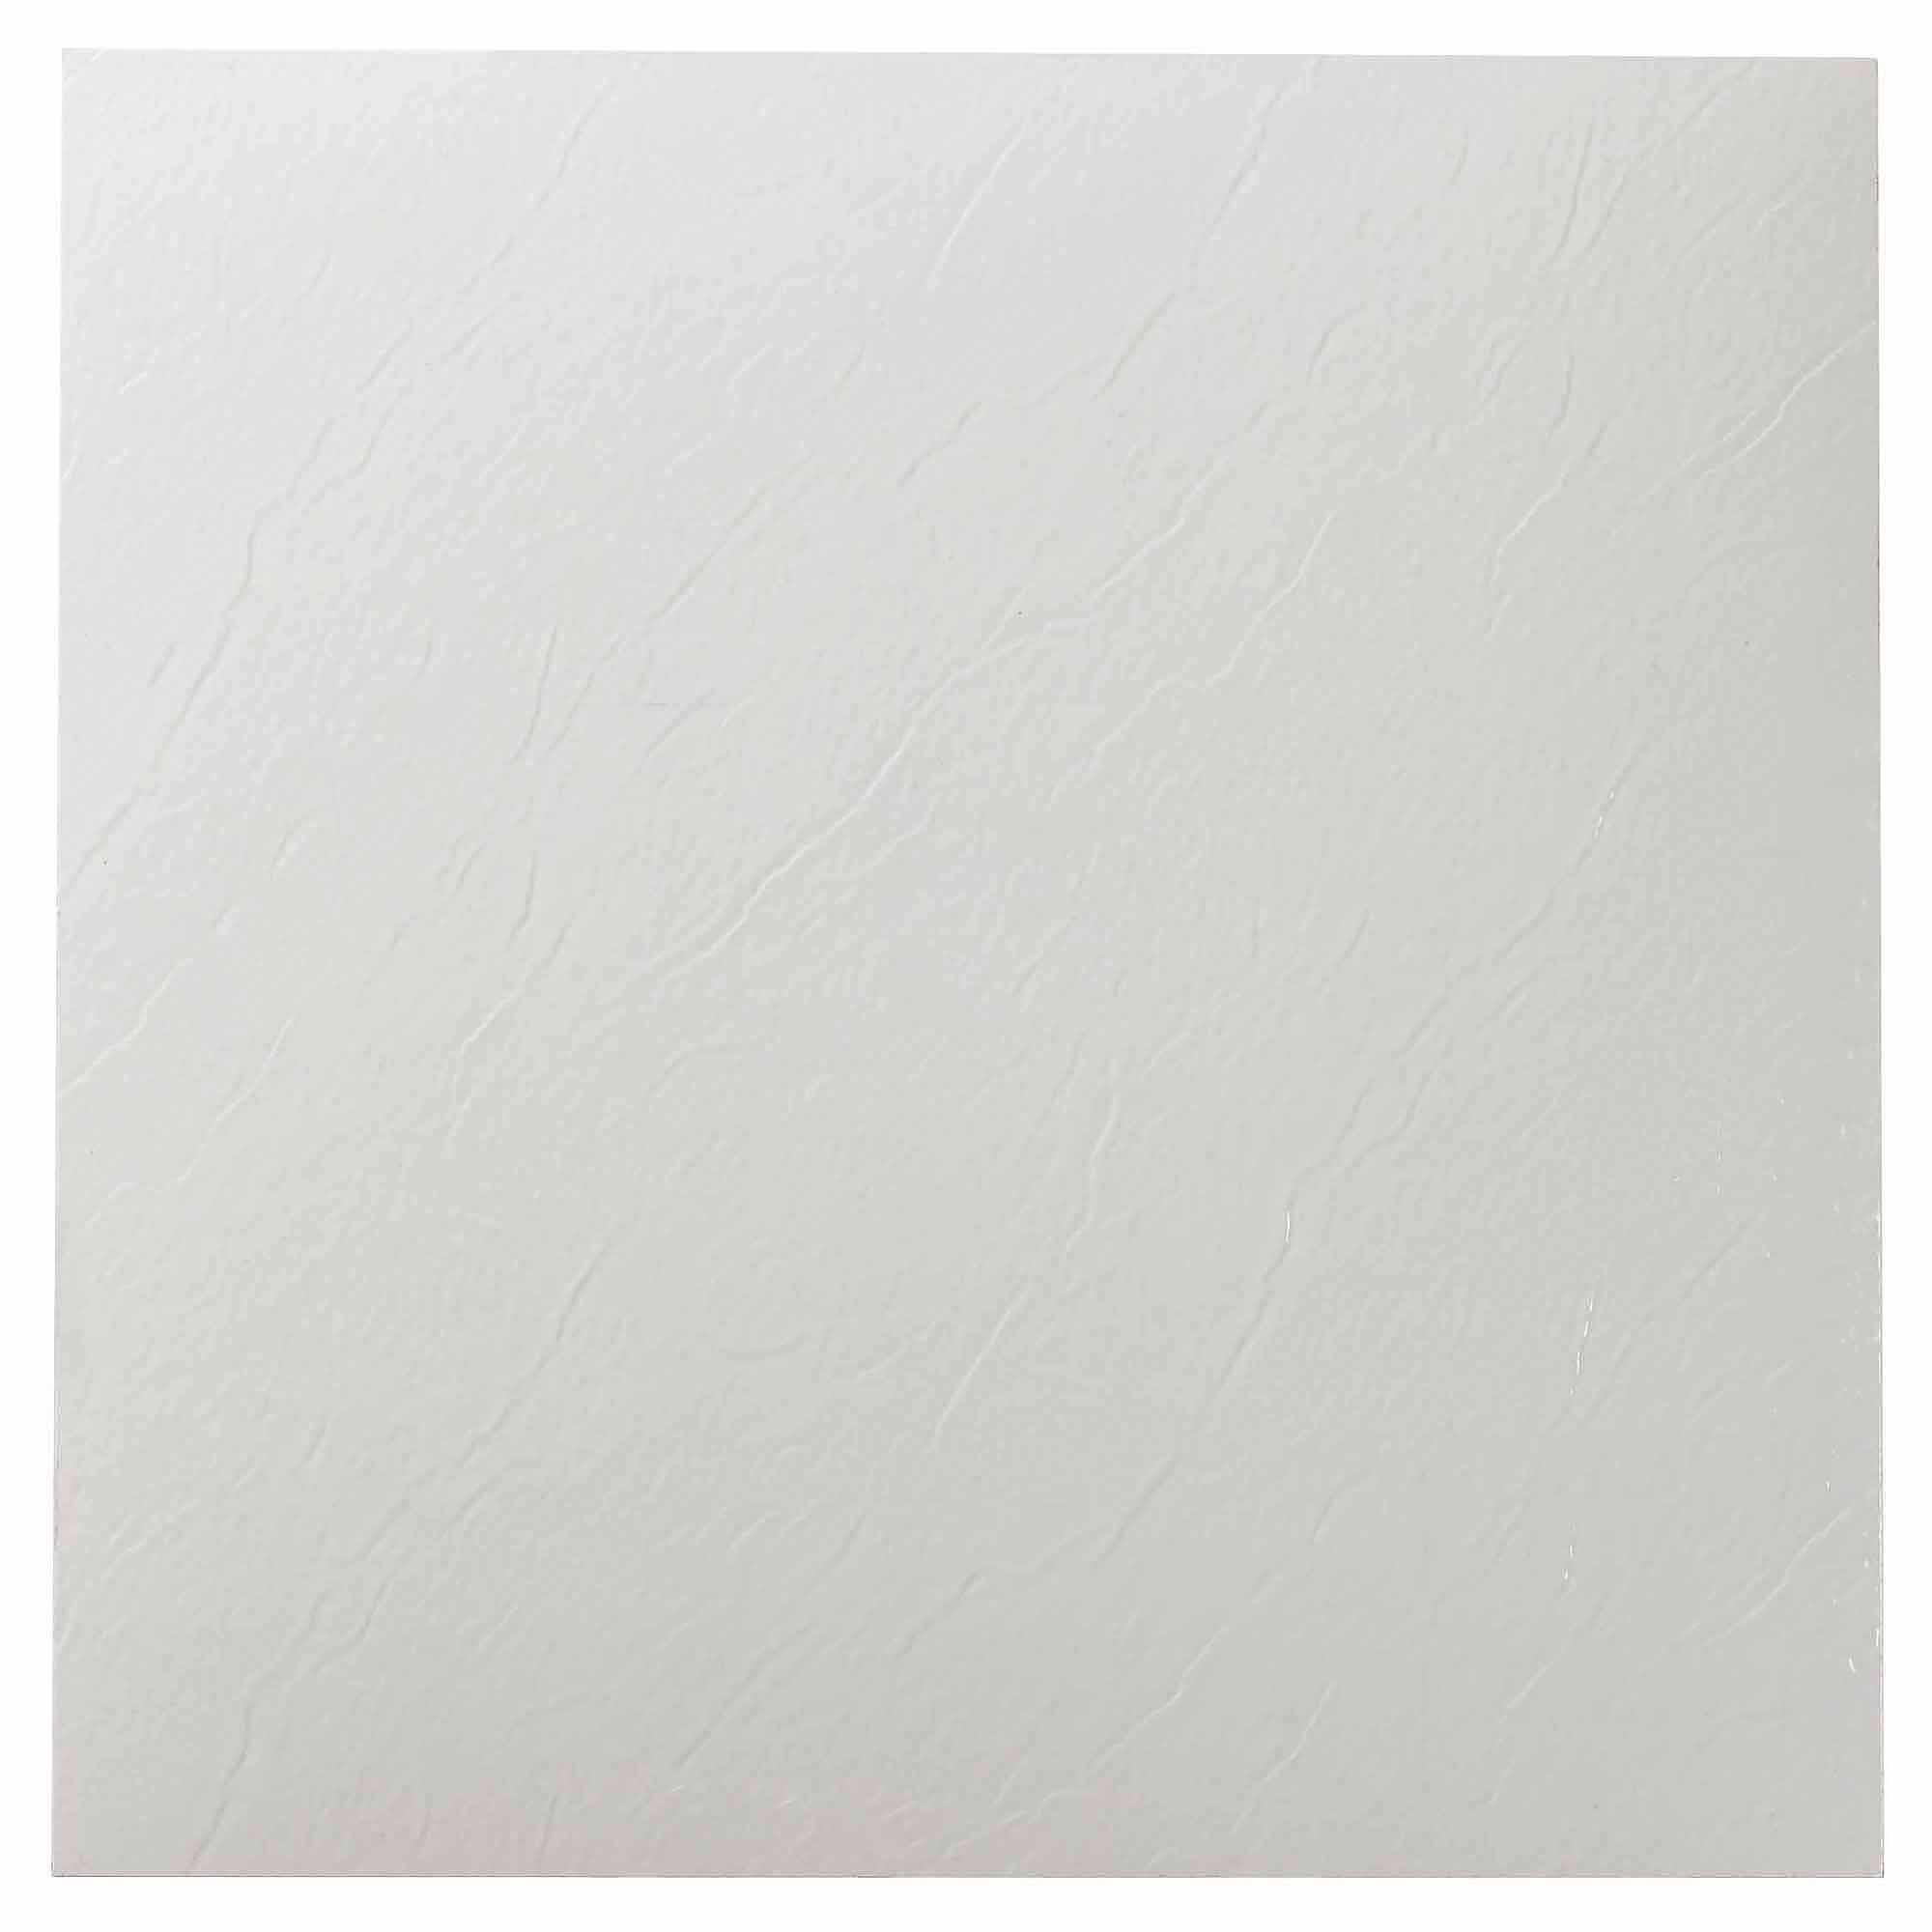 NEXUS White 12x12 Self Adhesive Vinyl Floor Tile - 20 Tiles/20 Sq.Ft.